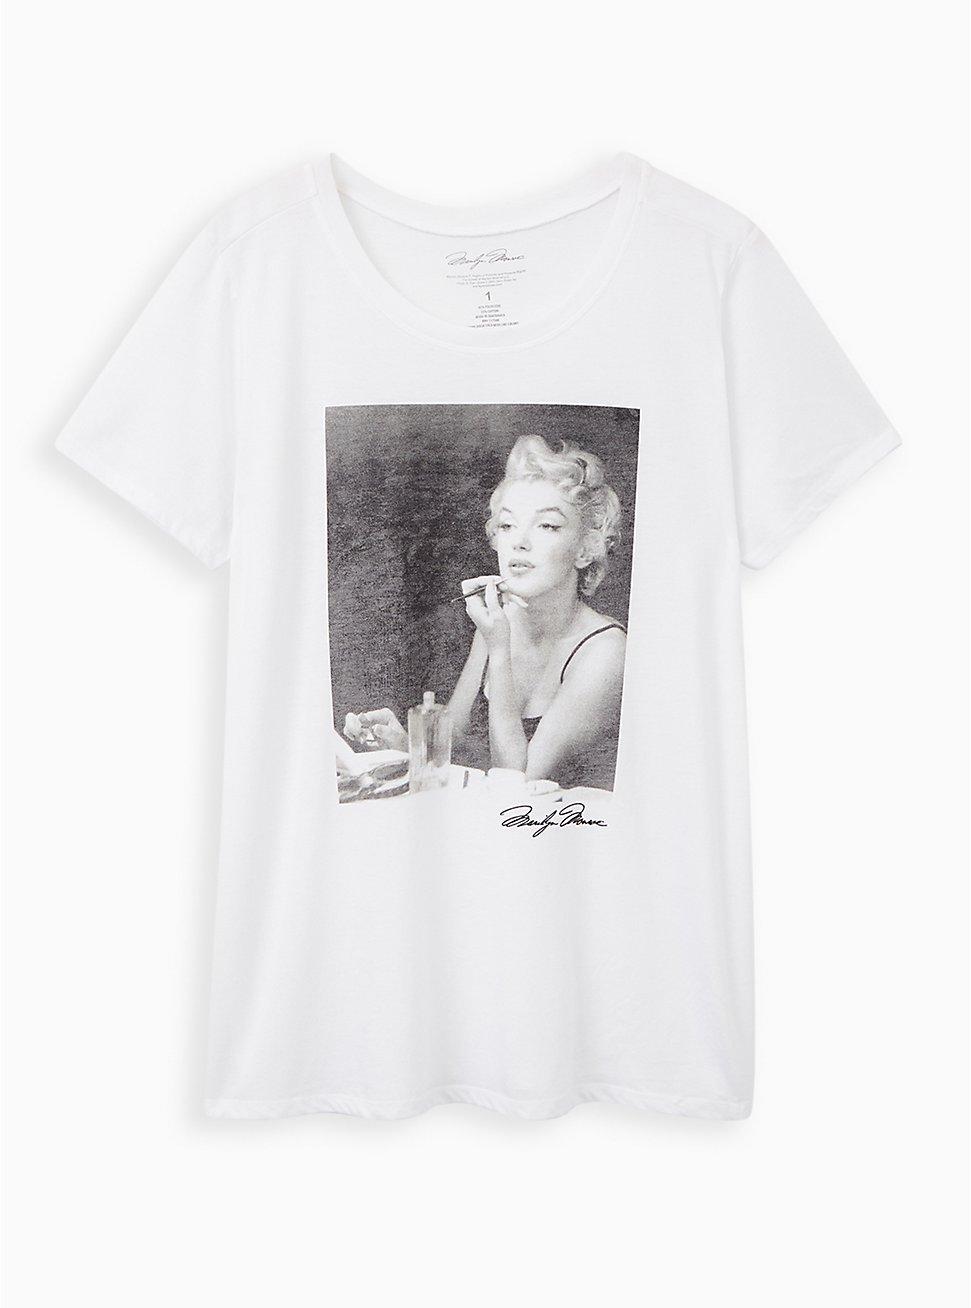 Slim Fit Crew Tee - Marilyn Monroe Makeup White, BRIGHT WHITE, hi-res